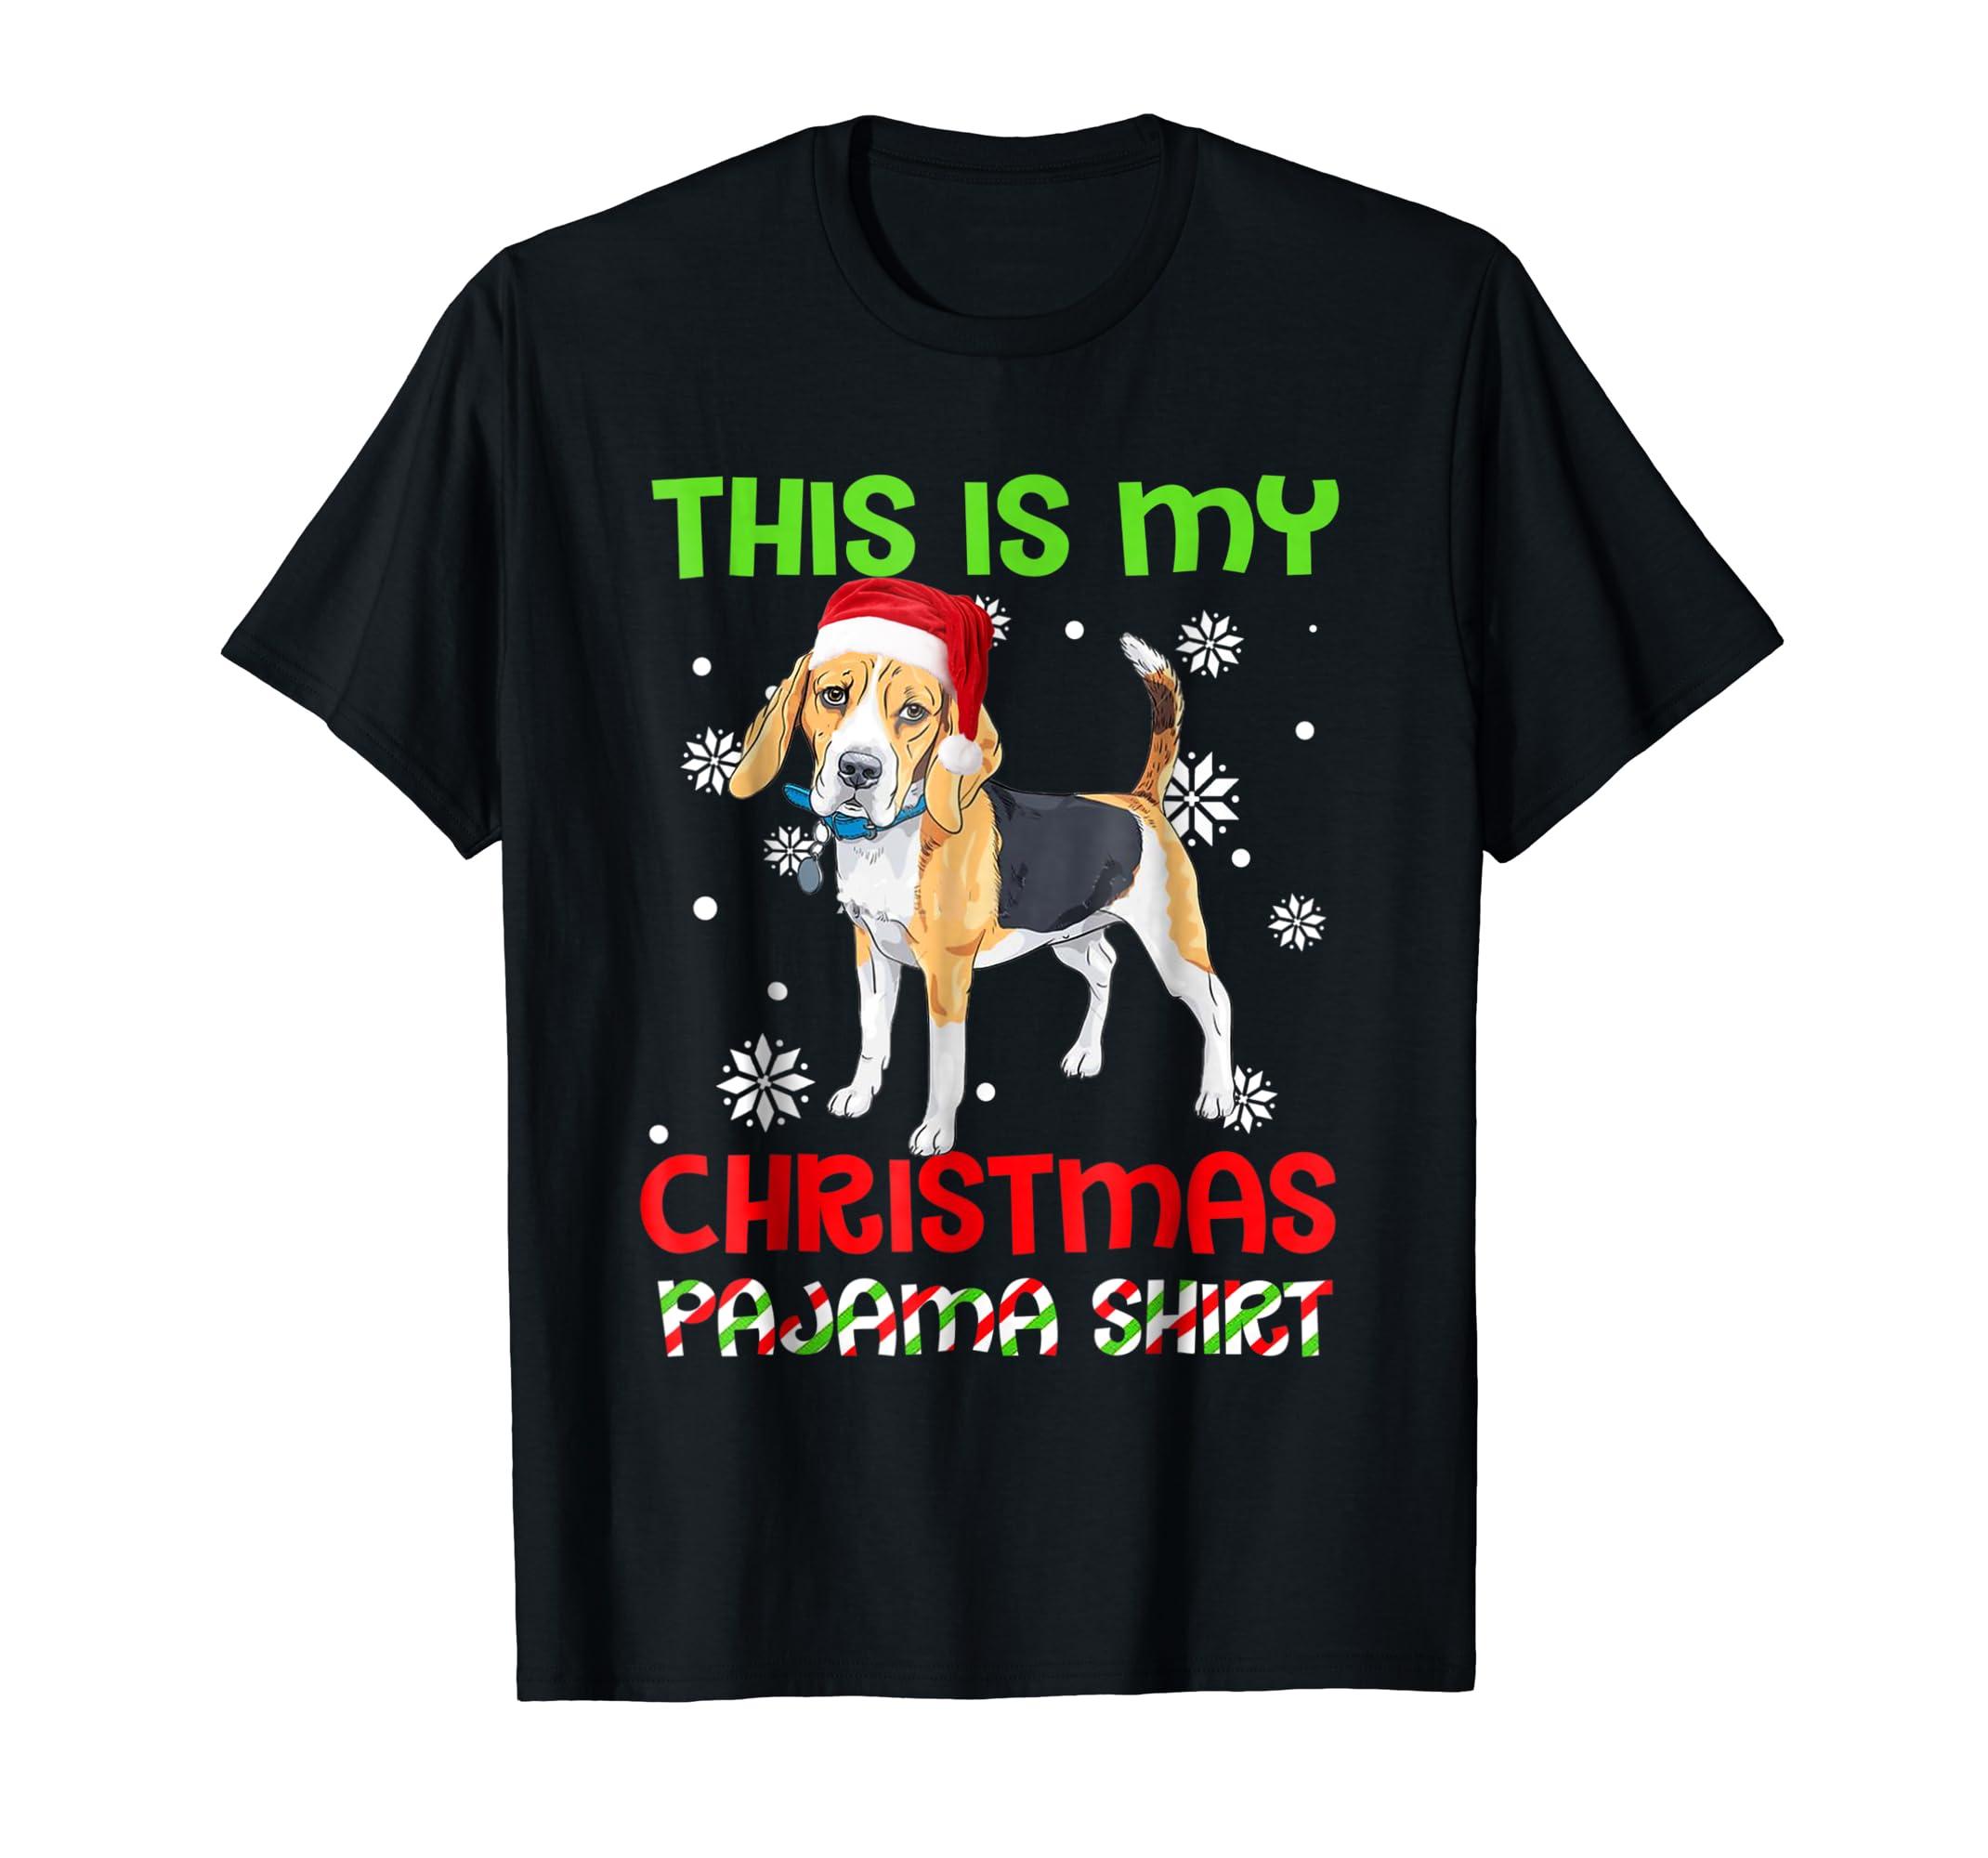 This Is My Christmas Pajama Shirt   Beagle Santa-Men's T-Shirt-Black